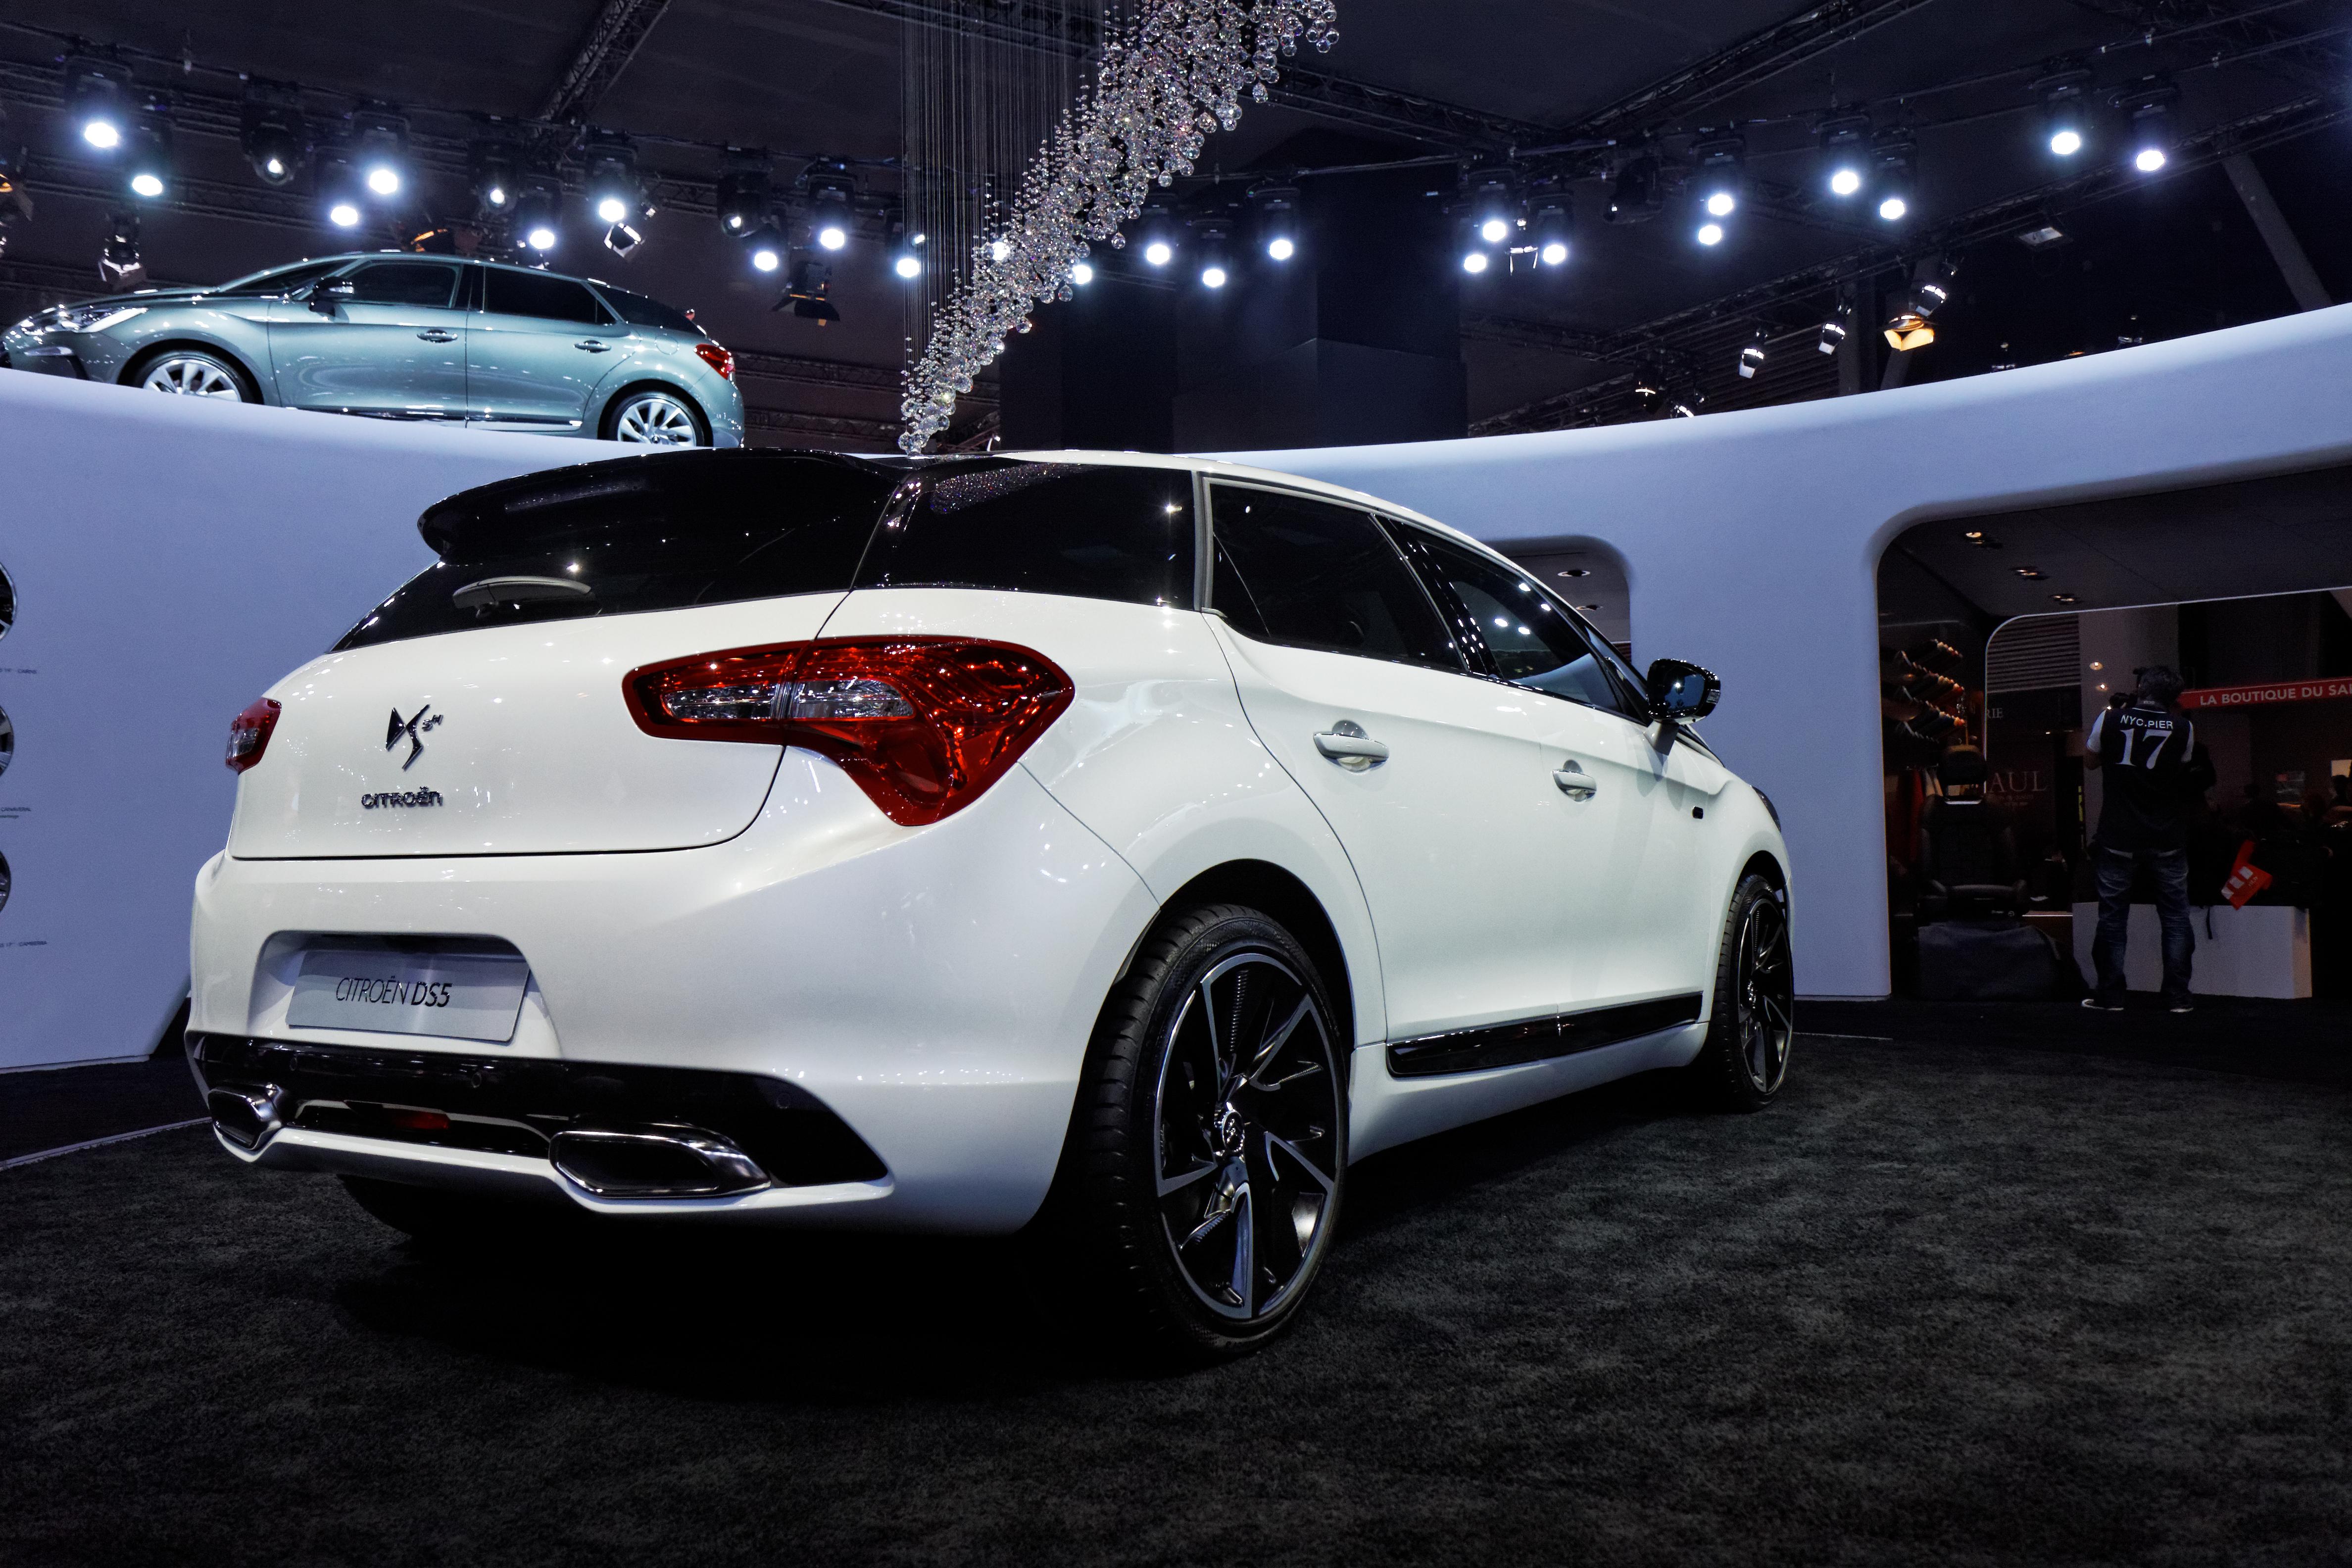 convertible automobile hybrid 2015 autos post. Black Bedroom Furniture Sets. Home Design Ideas